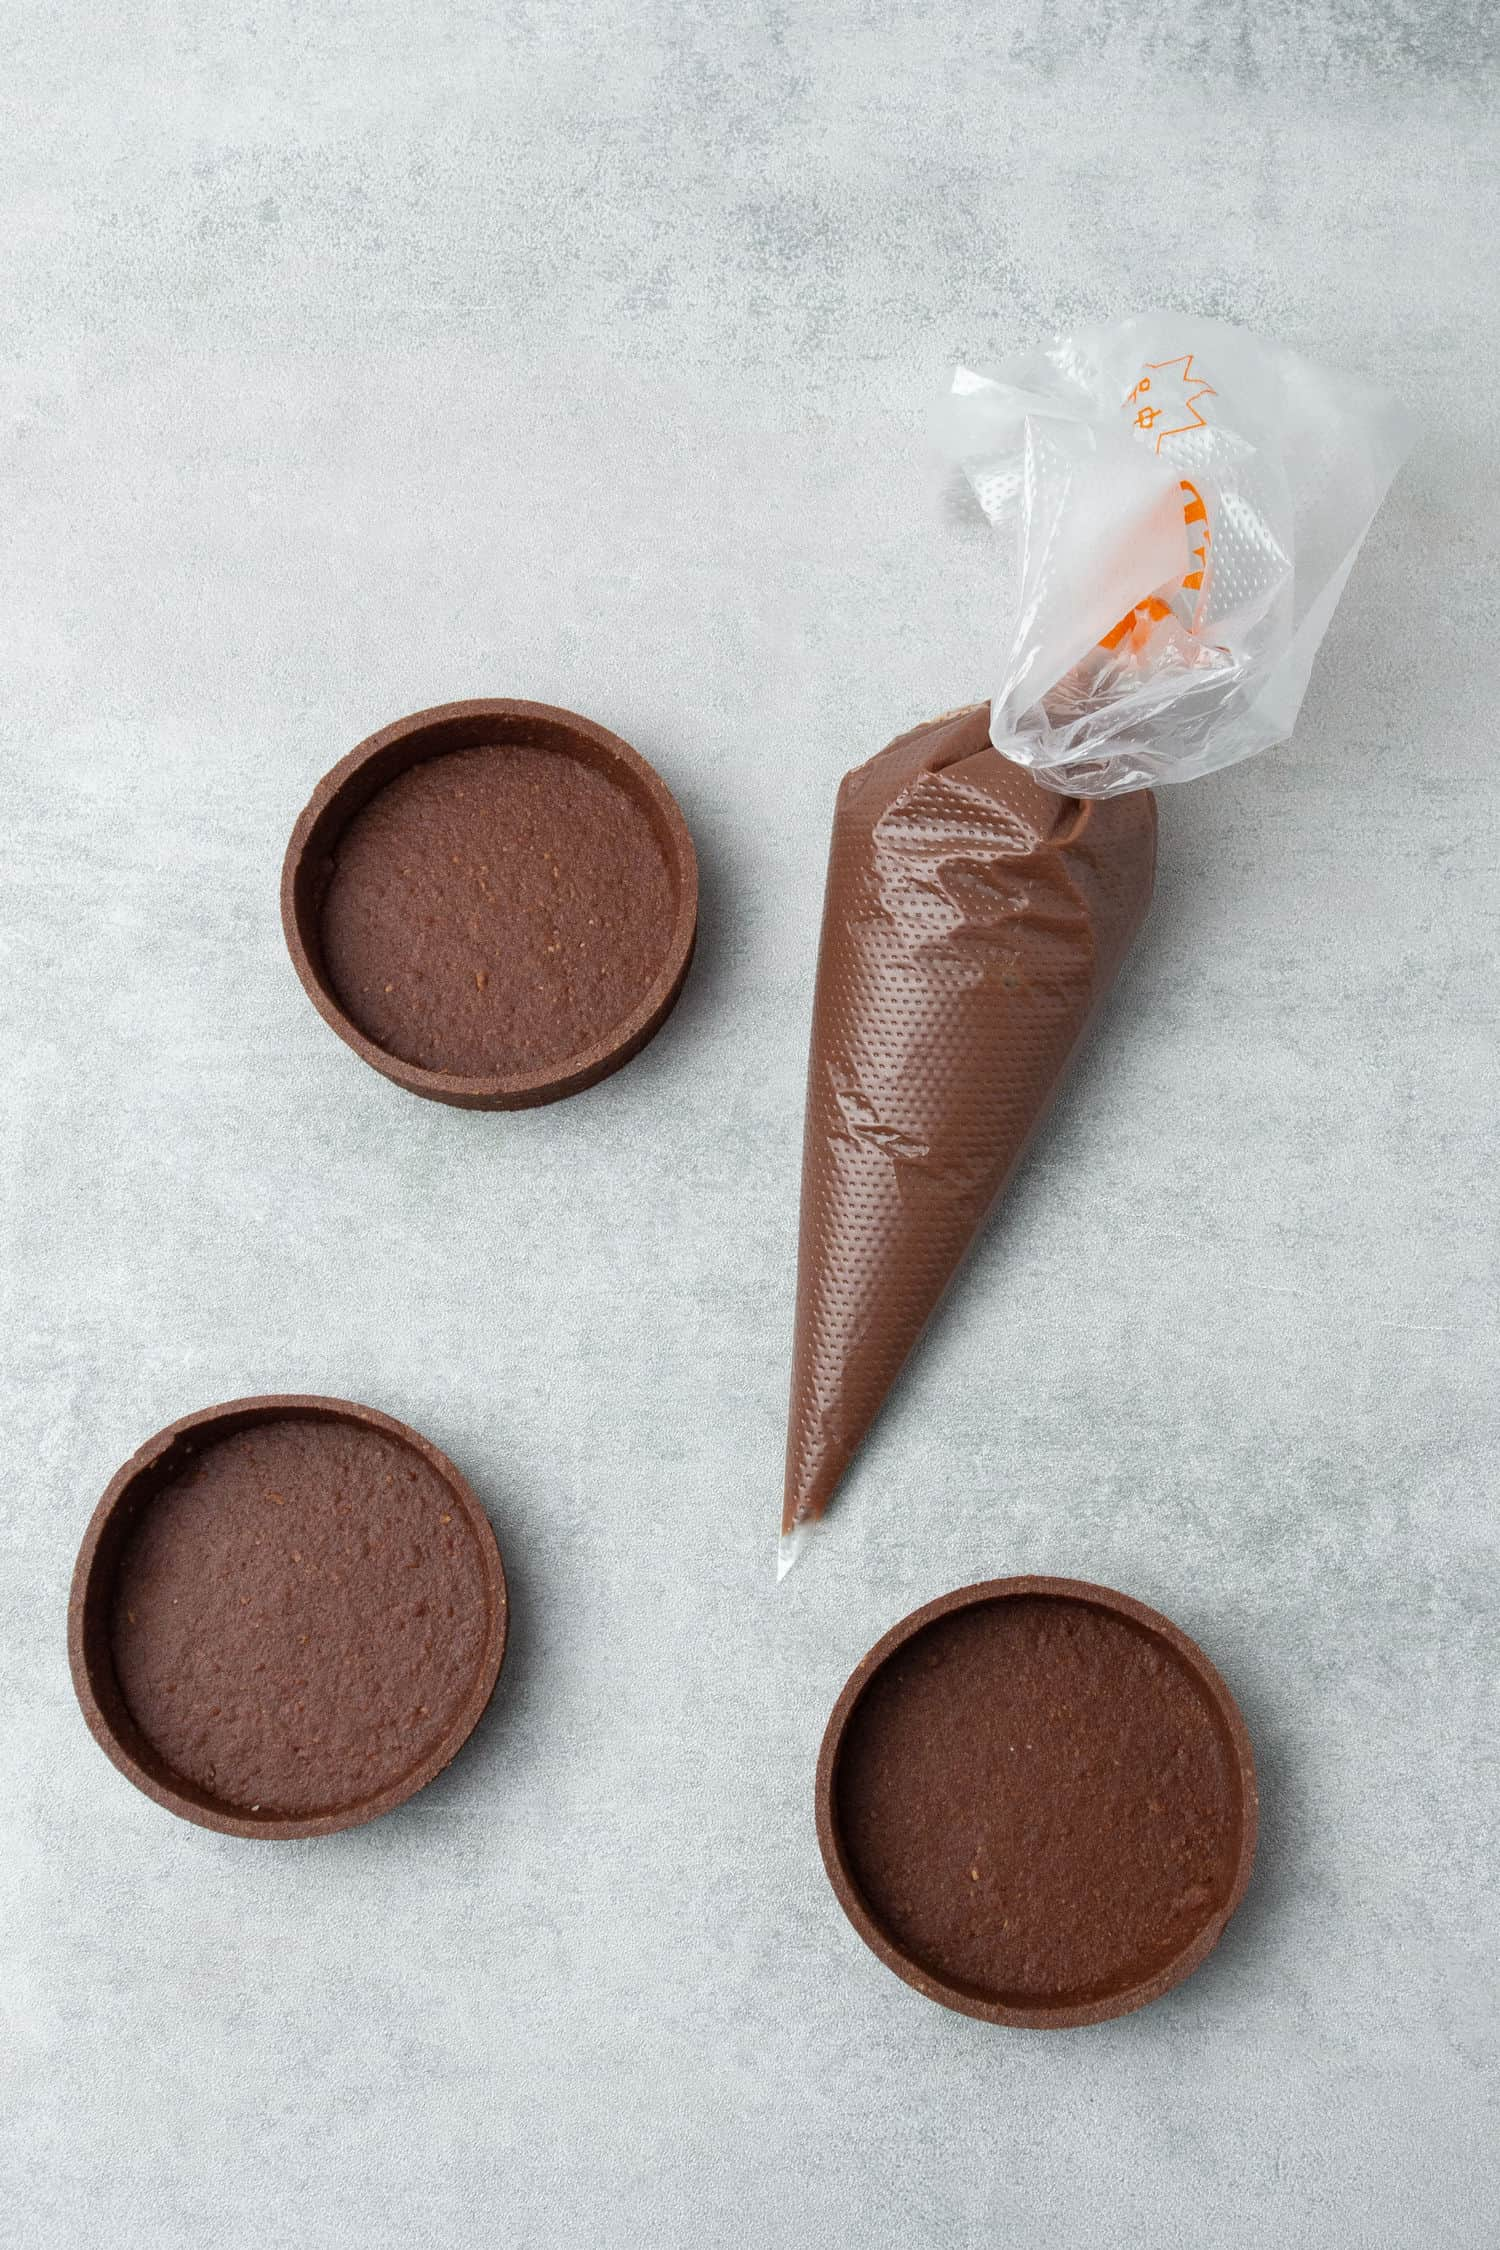 Chocolate & Passion fruit tart process